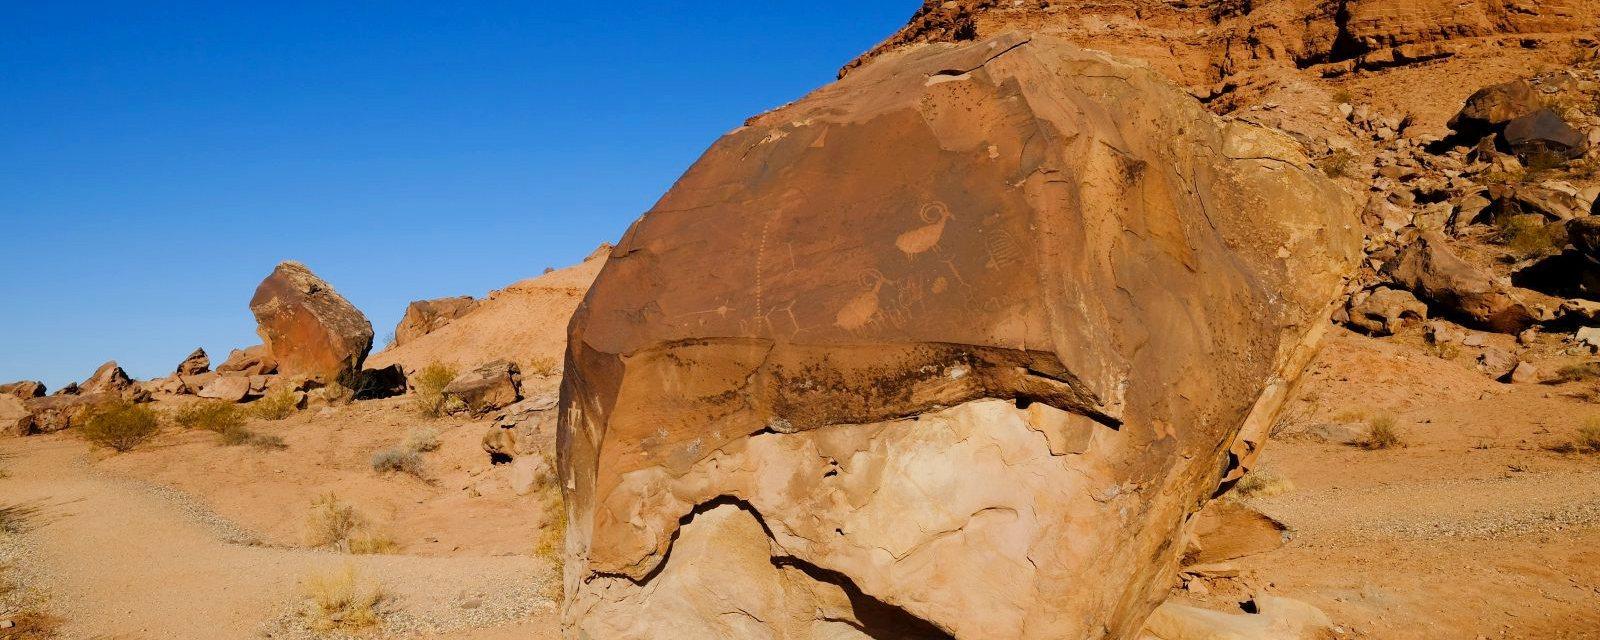 Little Black Mountain Petroglyph Site